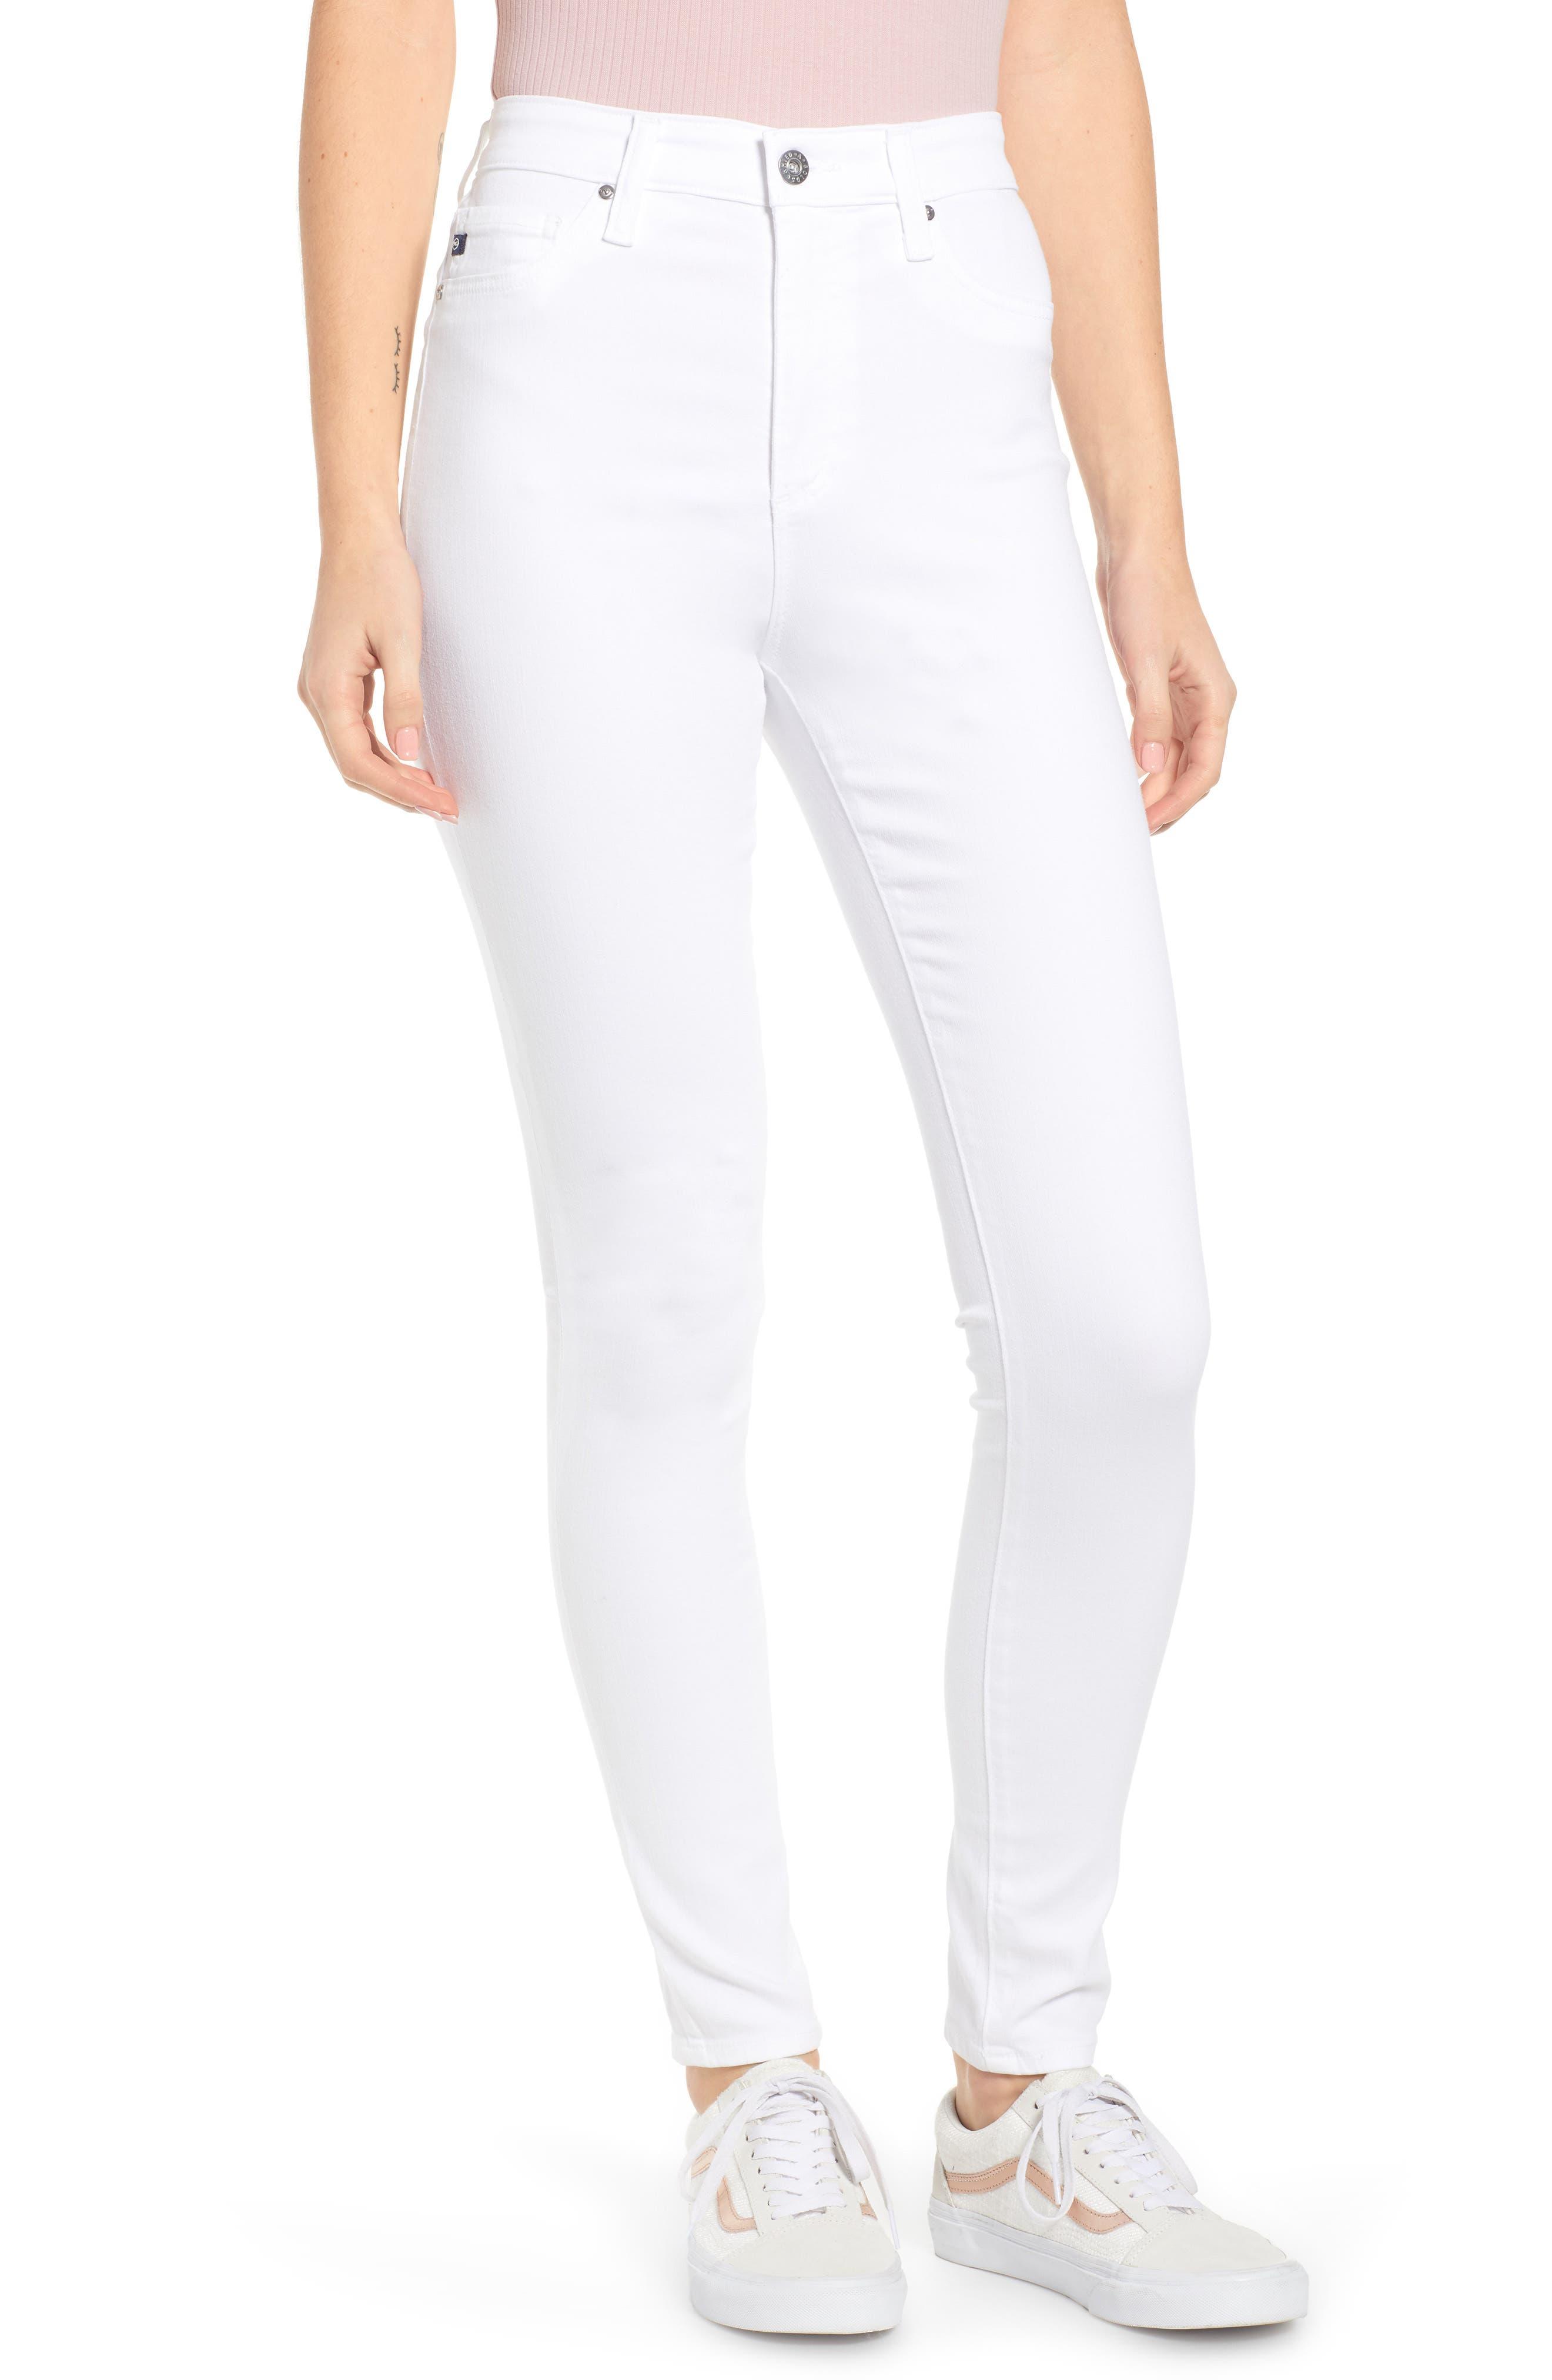 AG The Mila Super High Waist Ankle Skinny Jeans, Main, color, 110